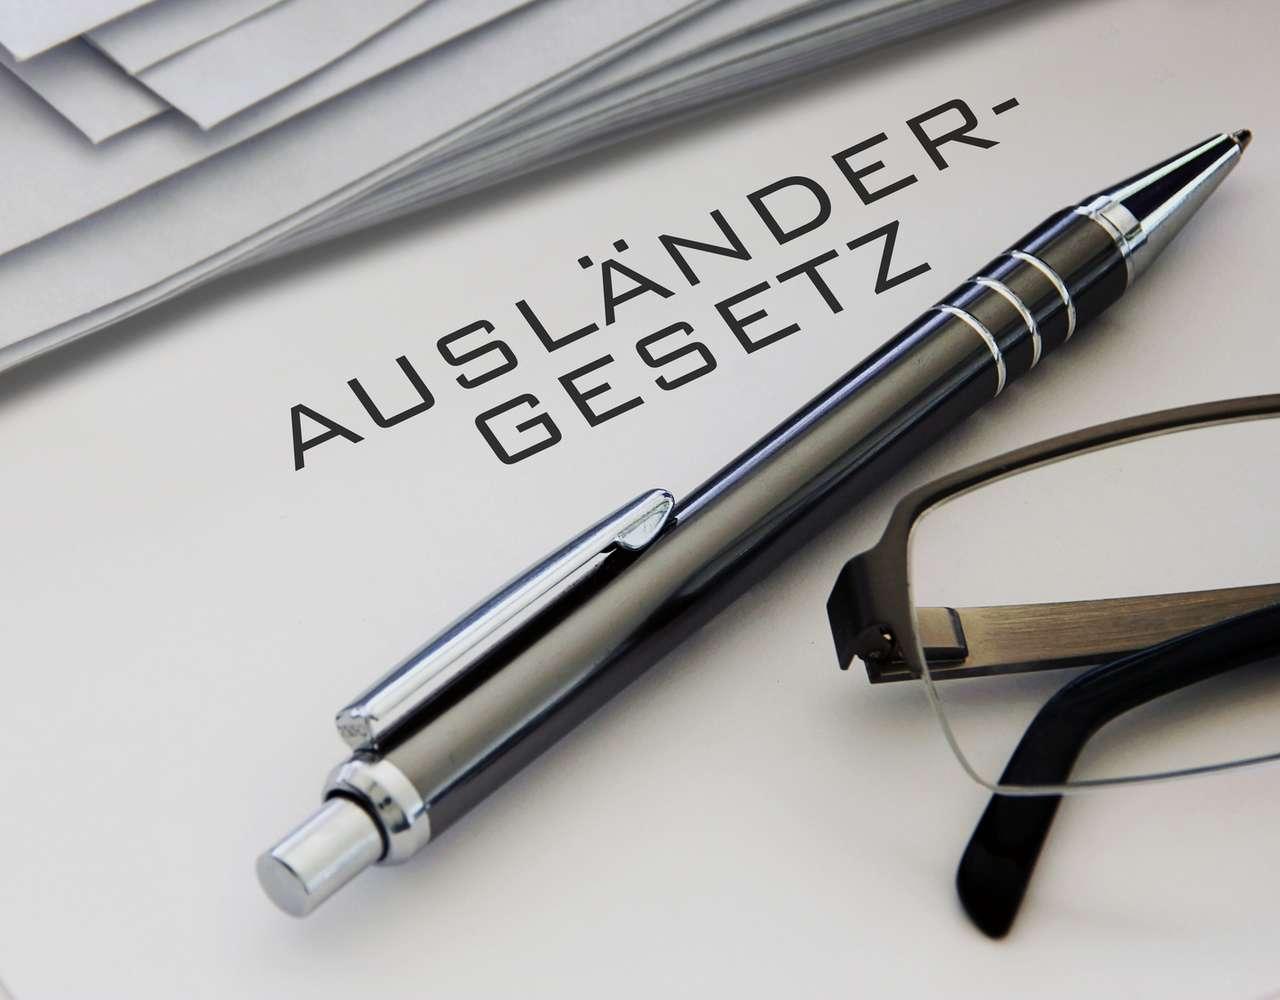 Ausländerrecht-Tarneden-Rechtsanwalt-Hannover